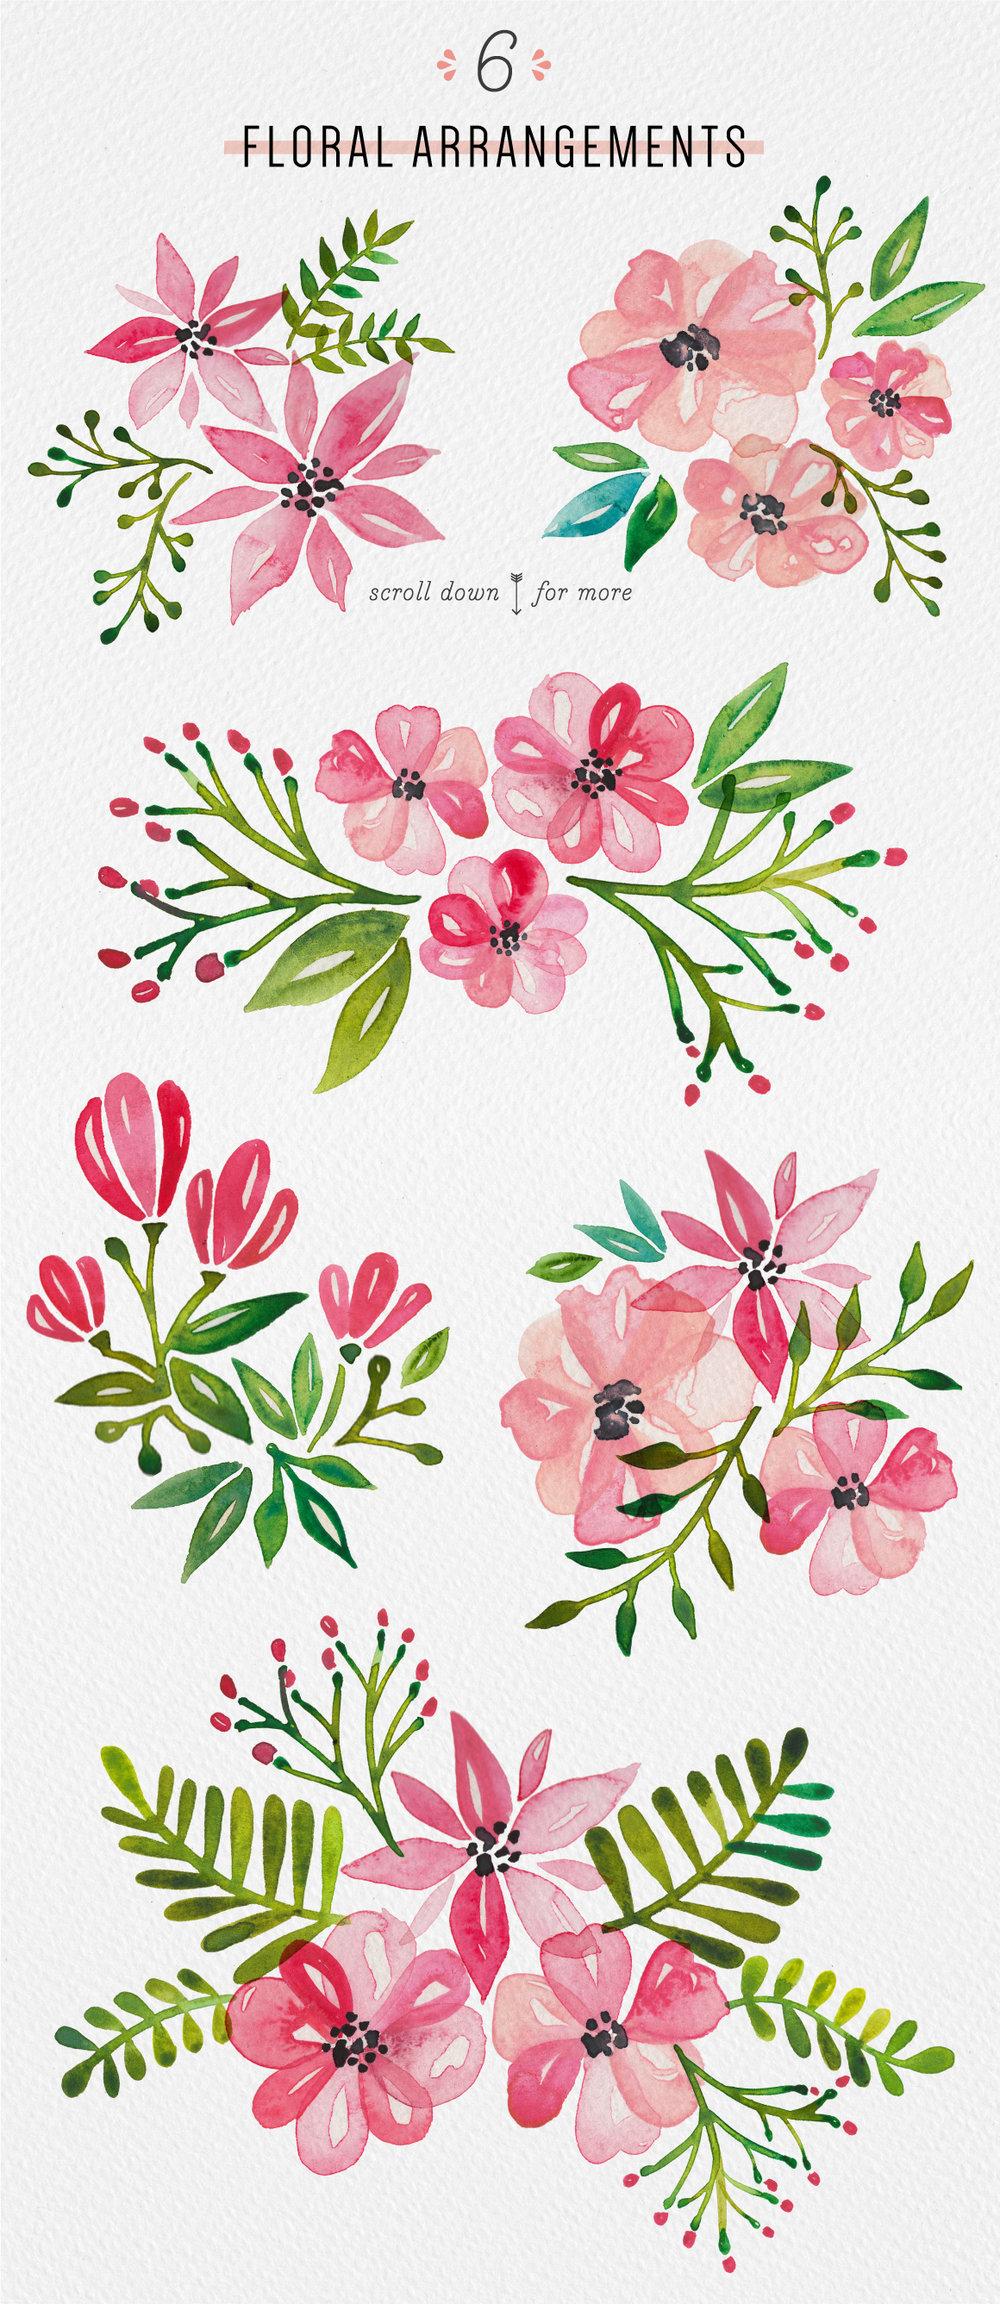 Floral-Arrangements.jpg